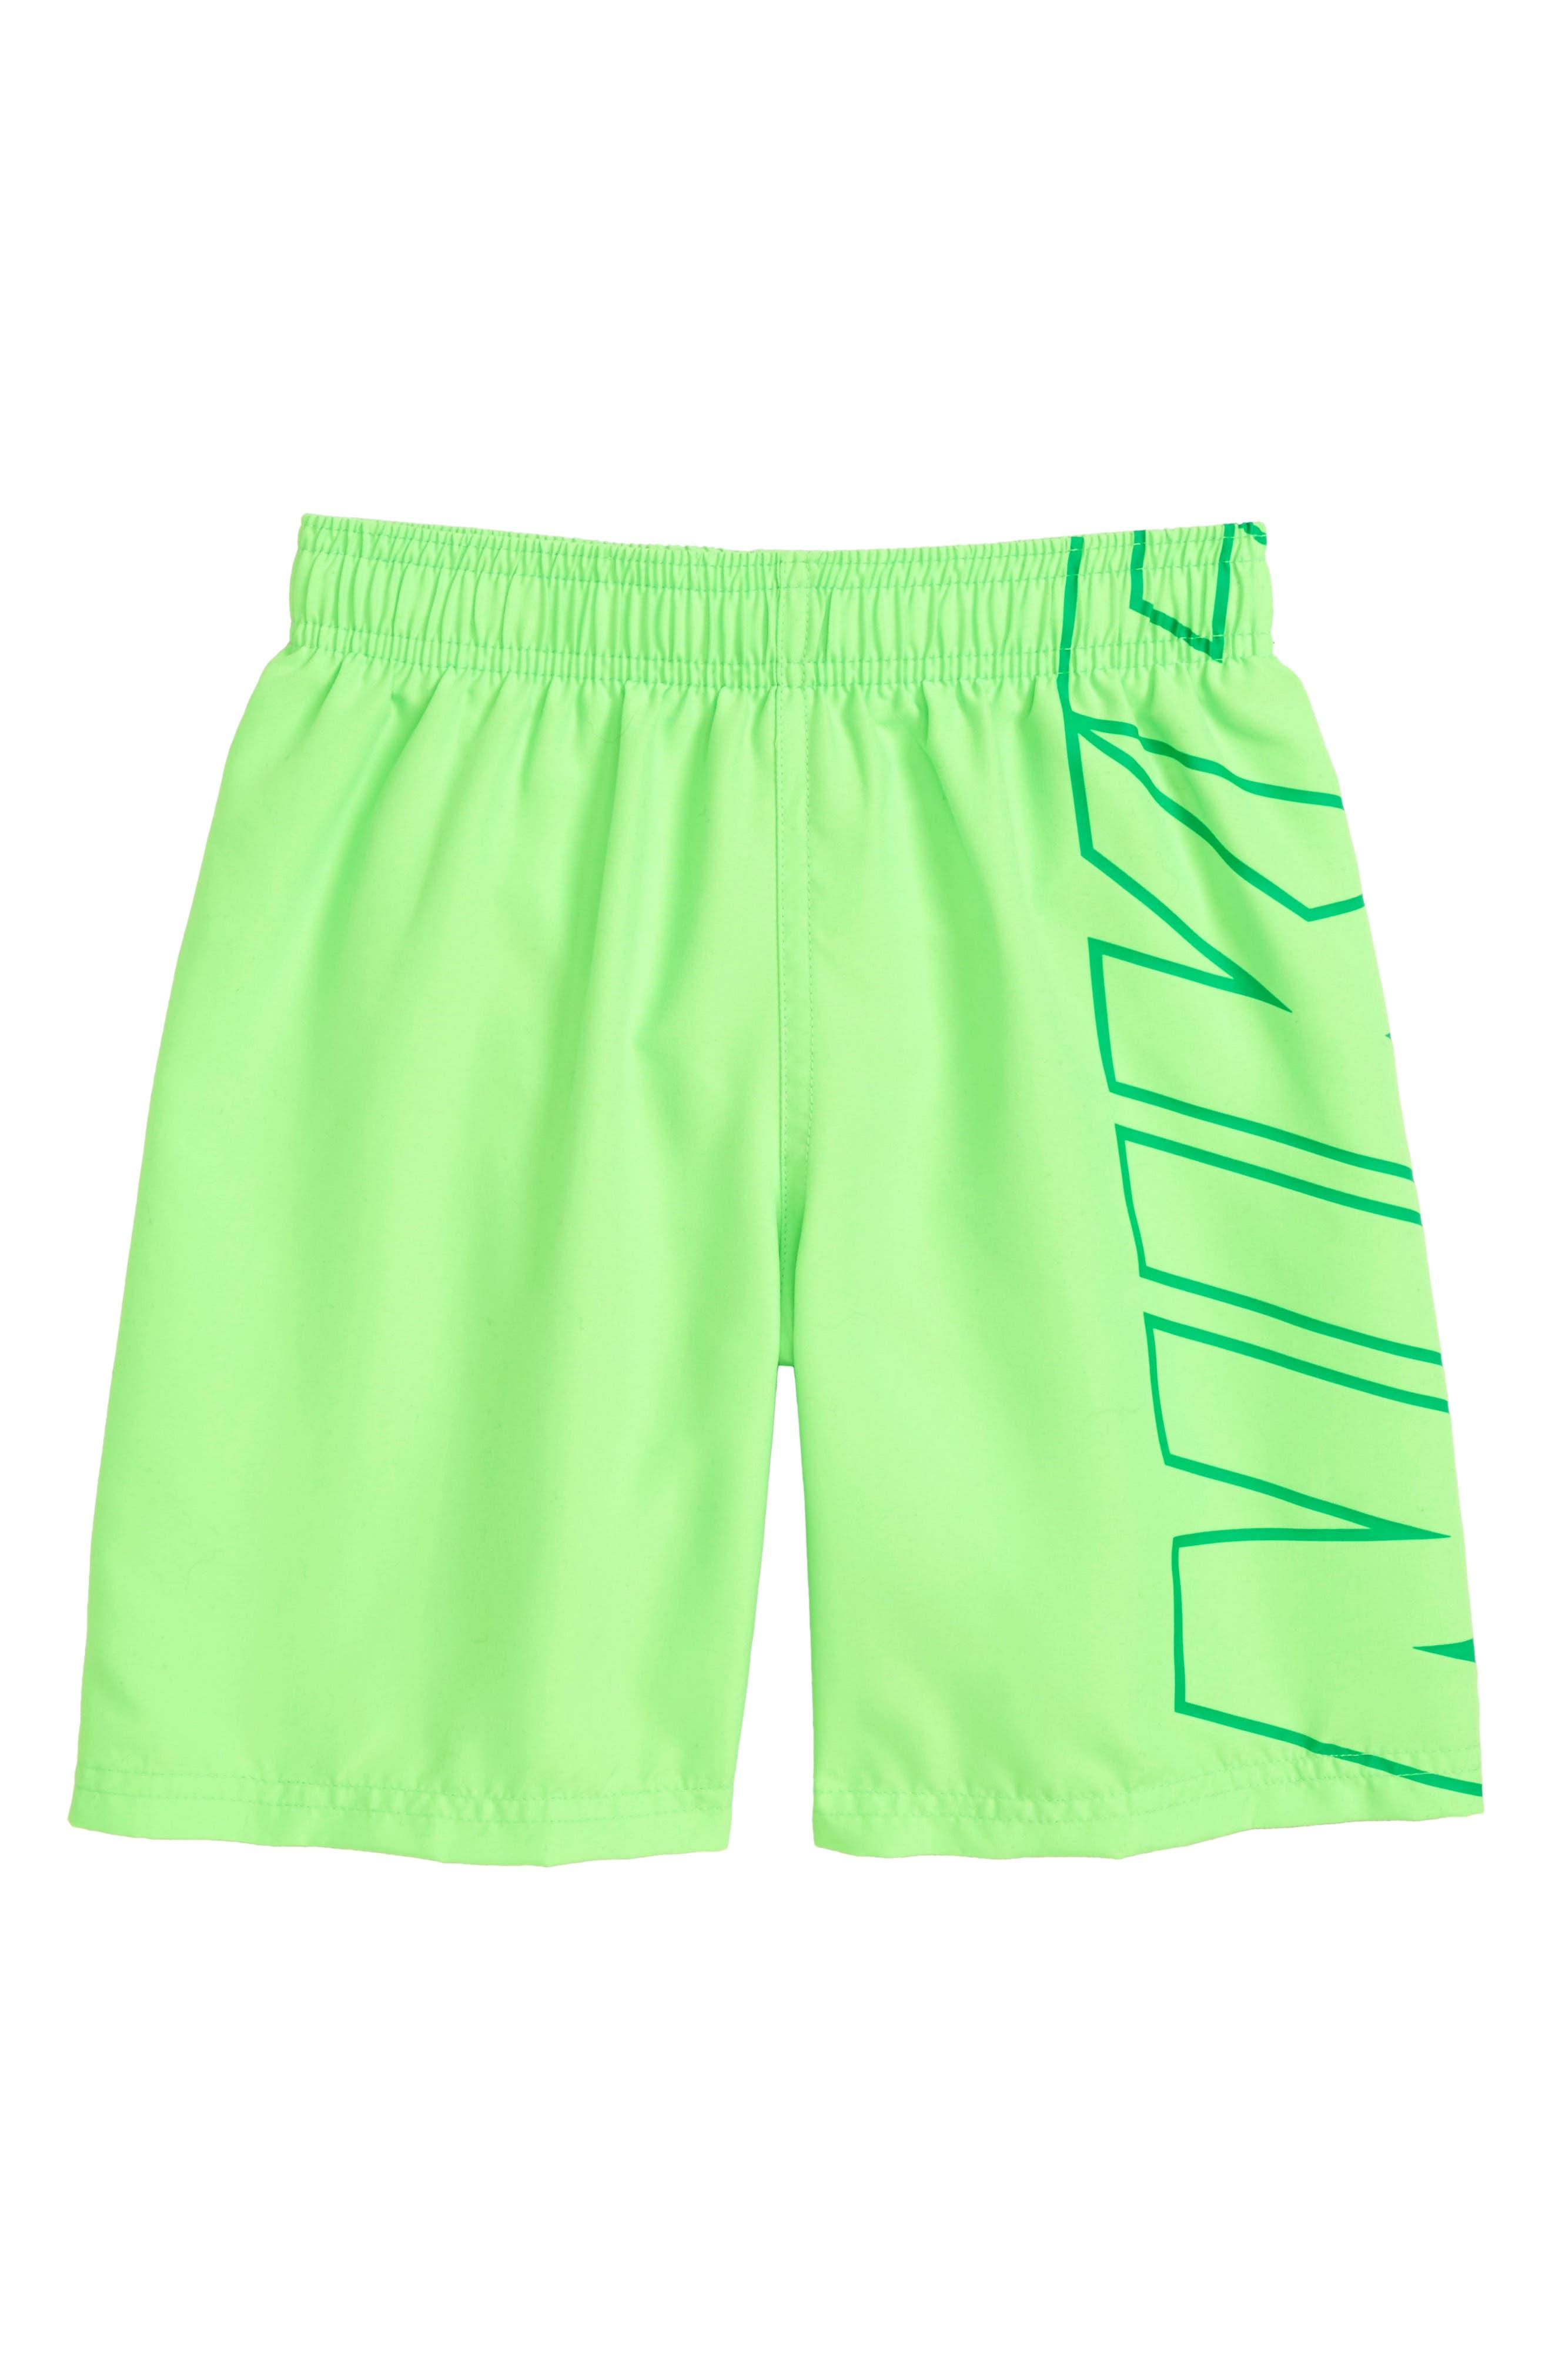 Breaker Board Shorts,                         Main,                         color, 370